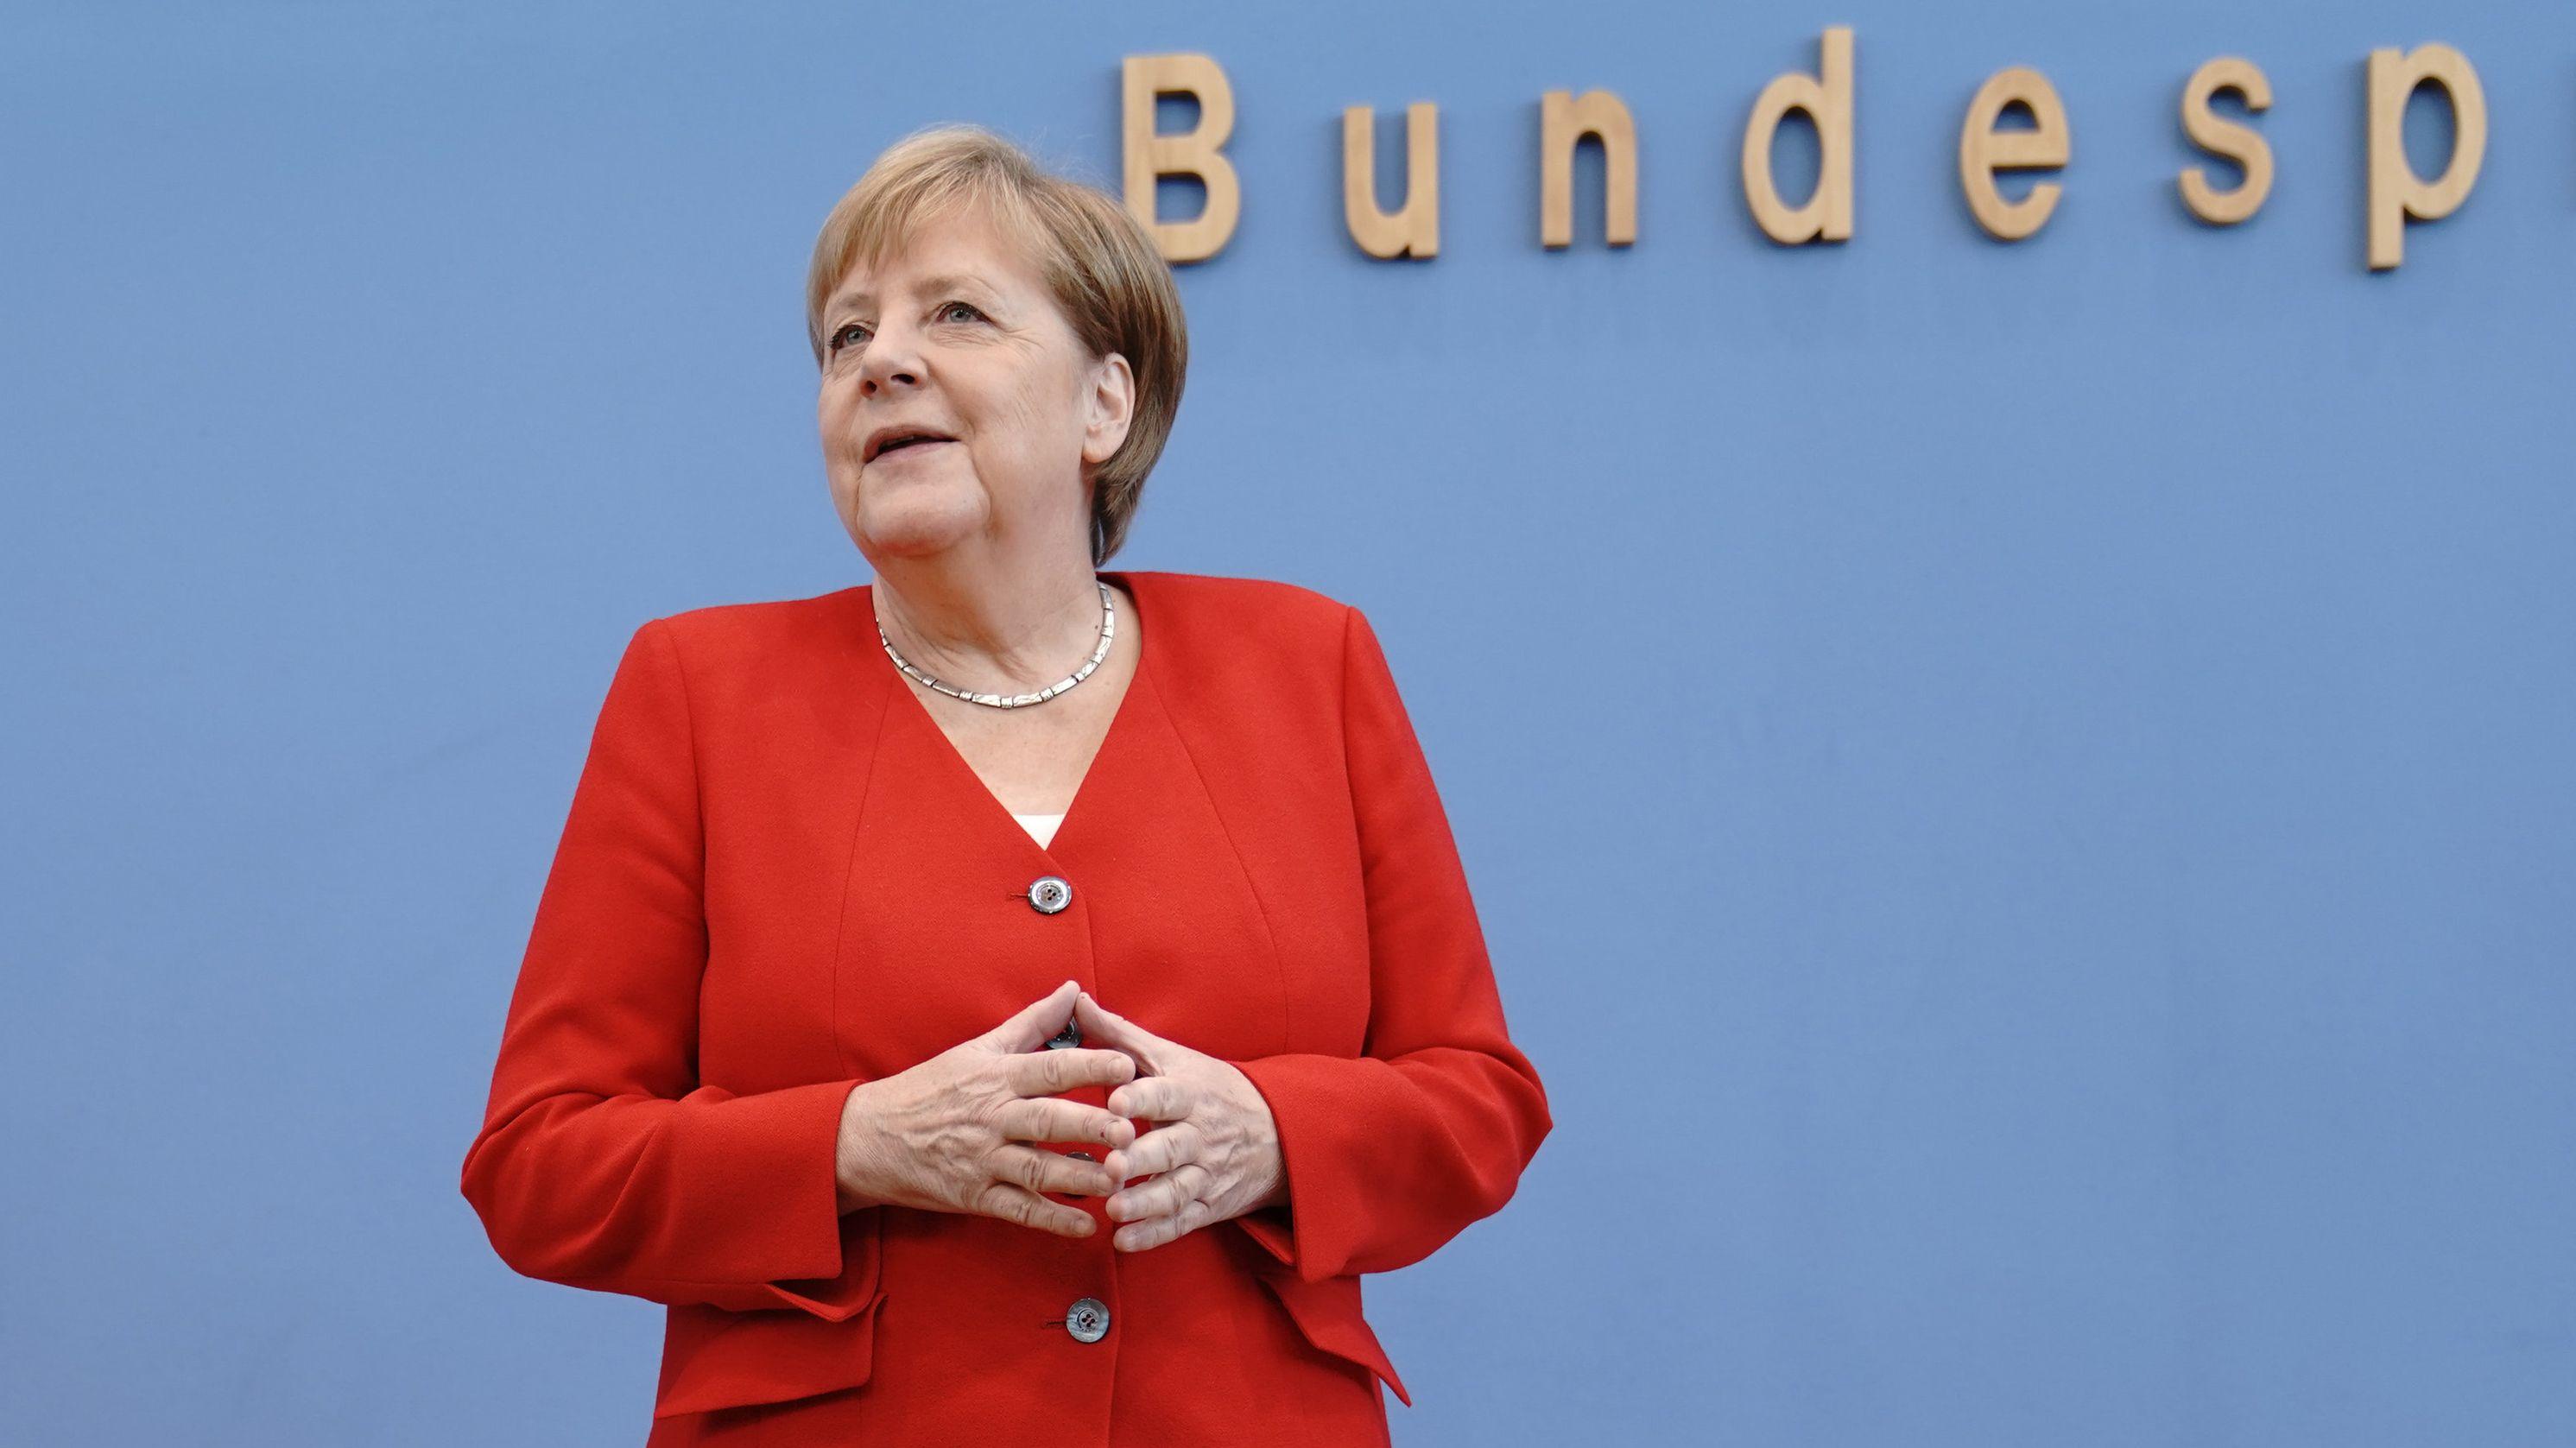 Angela Merkel bei der Bundespressekonferenz in Berlin